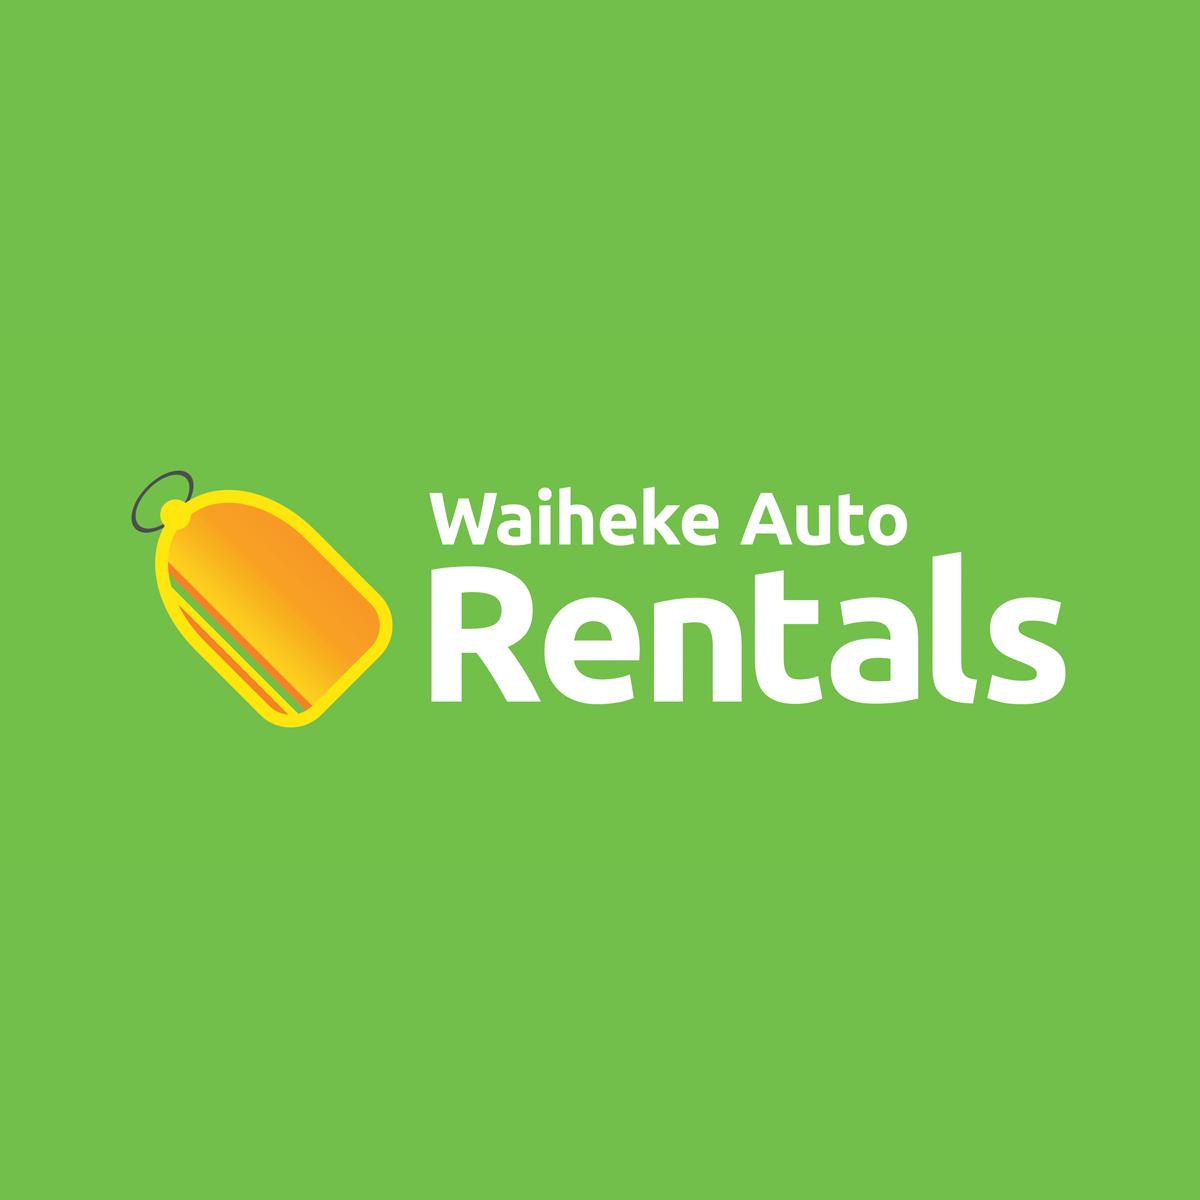 Waiheke Auto Rentals   Waiheke Auto Rentals